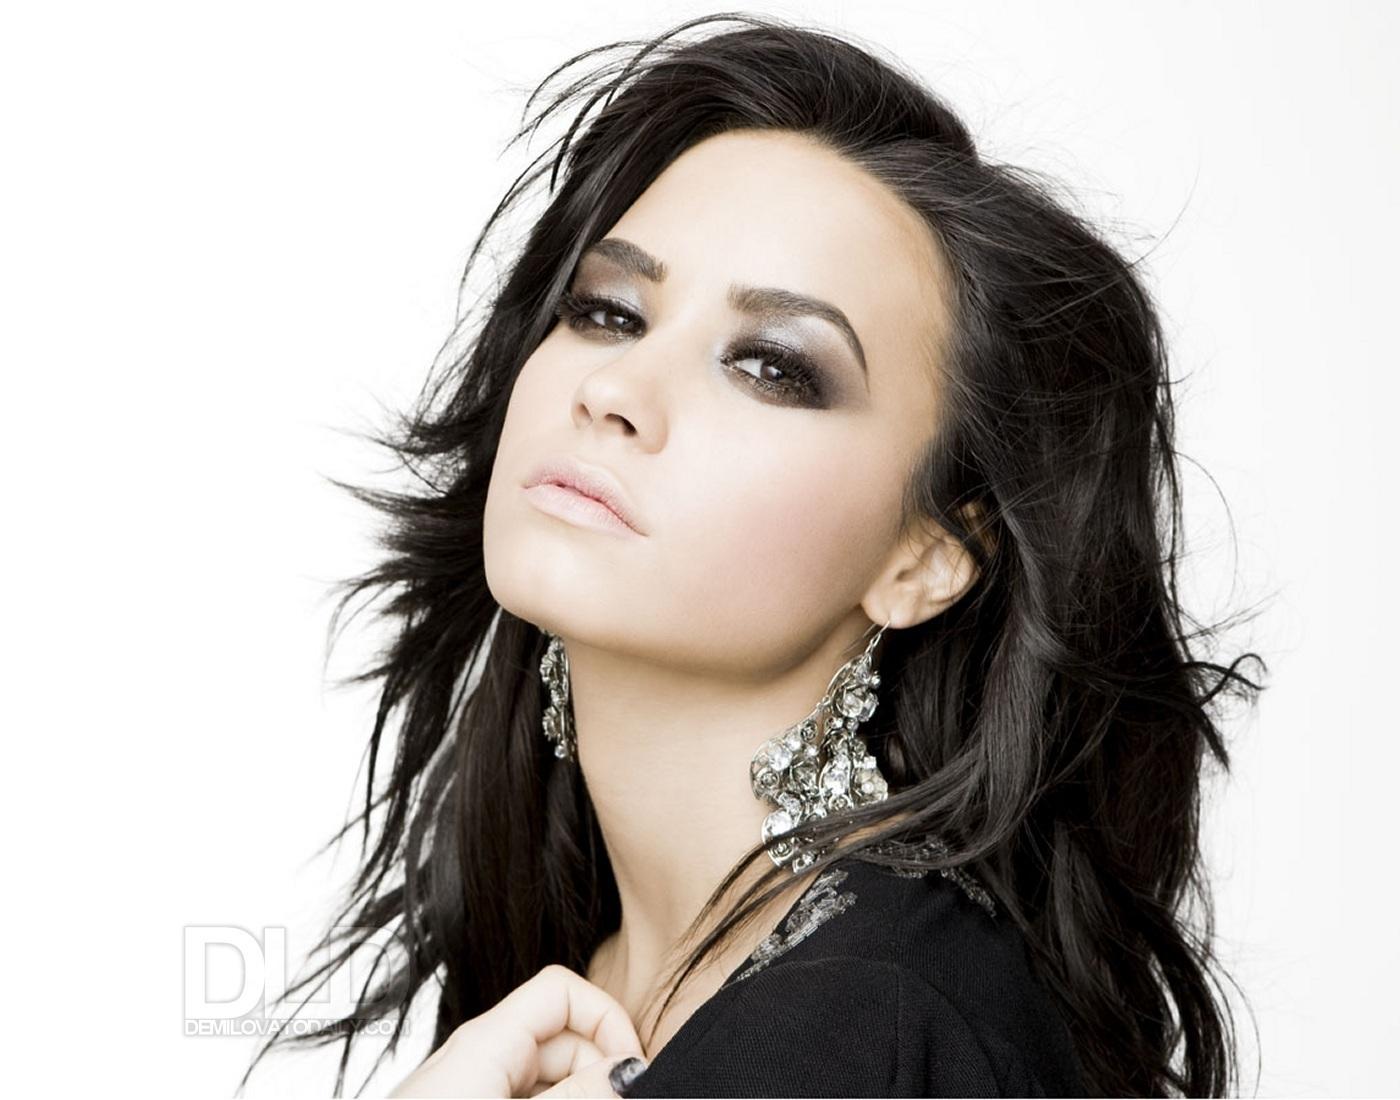 http://1.bp.blogspot.com/-3R3WPFPCcvw/TZ-nirZtdjI/AAAAAAAAAGc/R5cP4l8udeA/s1600/Demi-Lovato-Wallpaper-demi-lovato-8239474-1400-1100.jpg